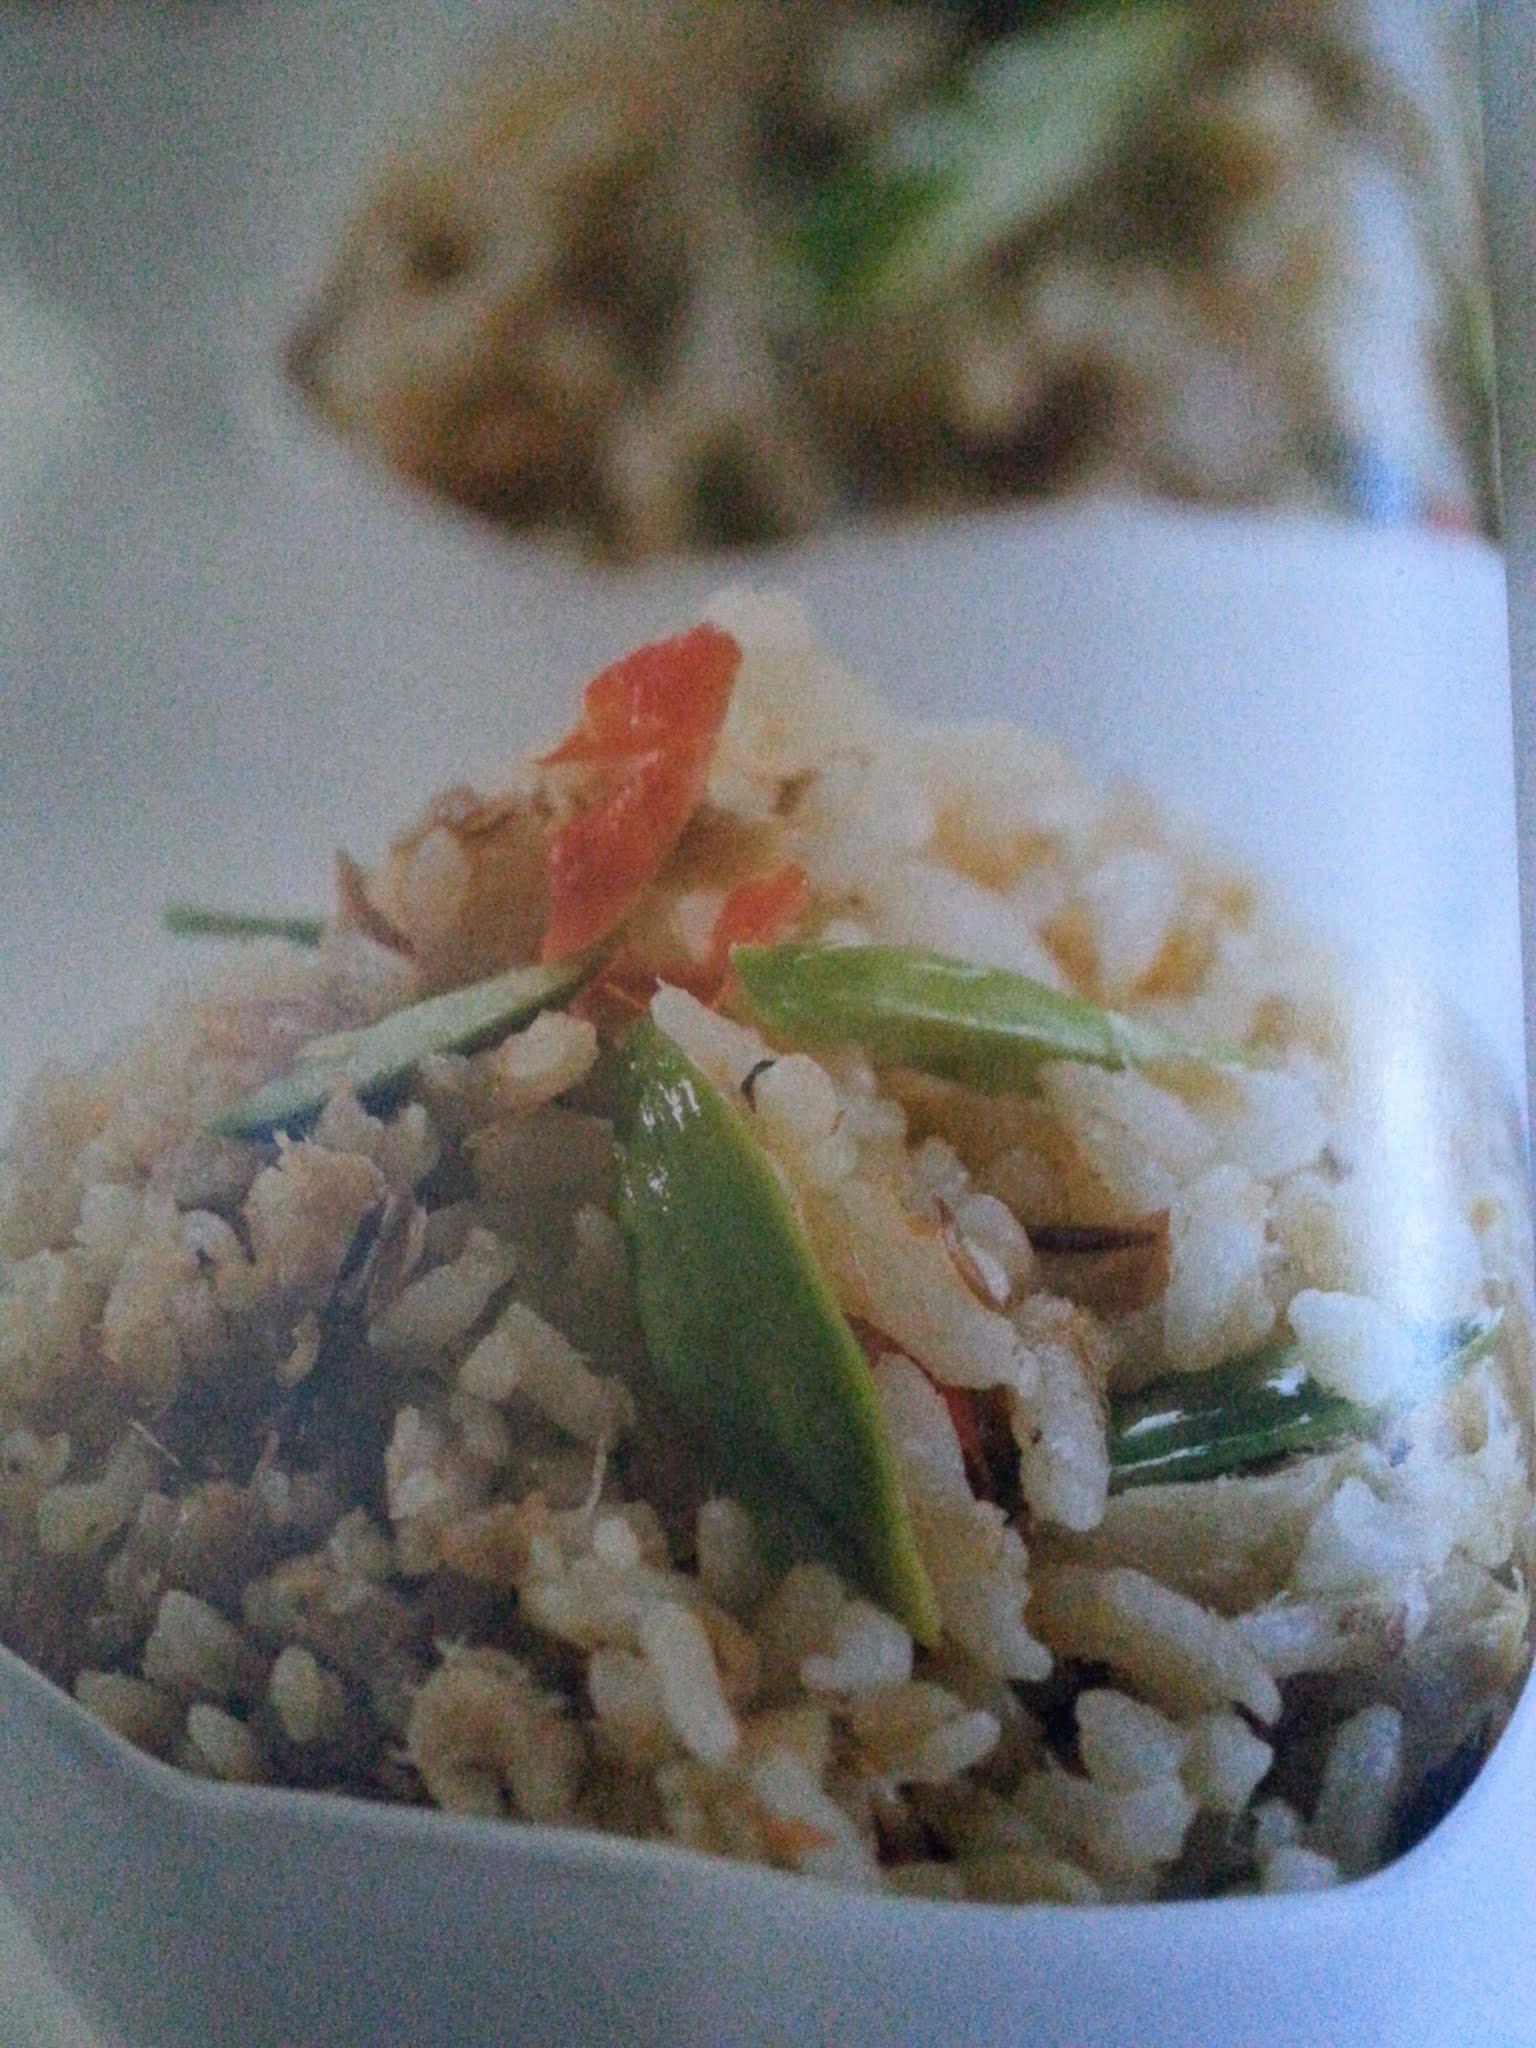 Aneka Resepi Nasi Mudah Dan Sedap Untuk Berbuka Puasa